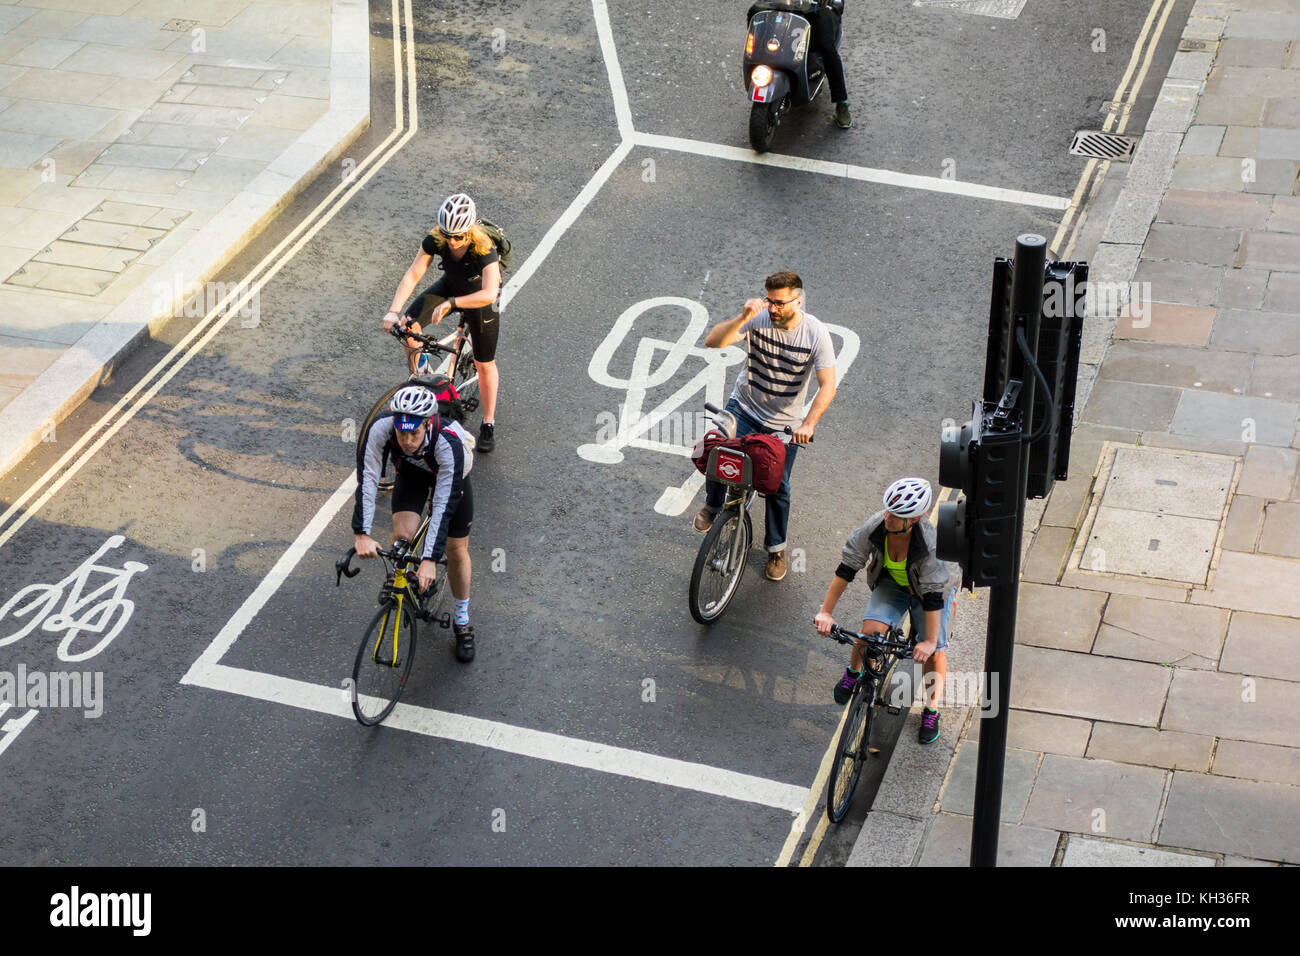 Cyclists waiting at advanced stop line (ASL), advanced stop box, bike box road markings at signalised road junction - Stock Image